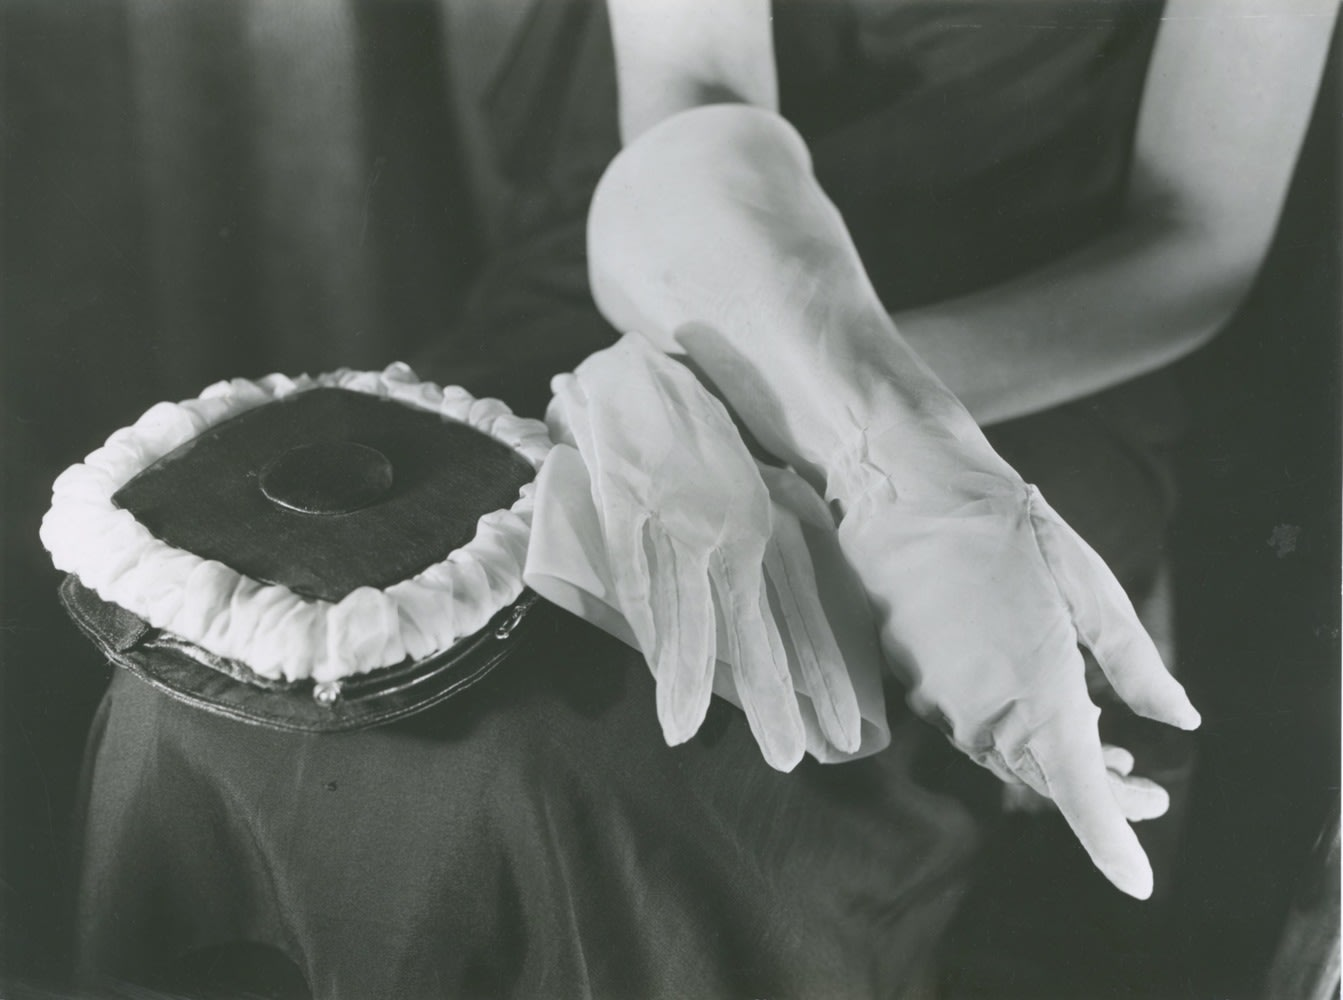 Germaine Krull, Des gants blancs, 1925-1926